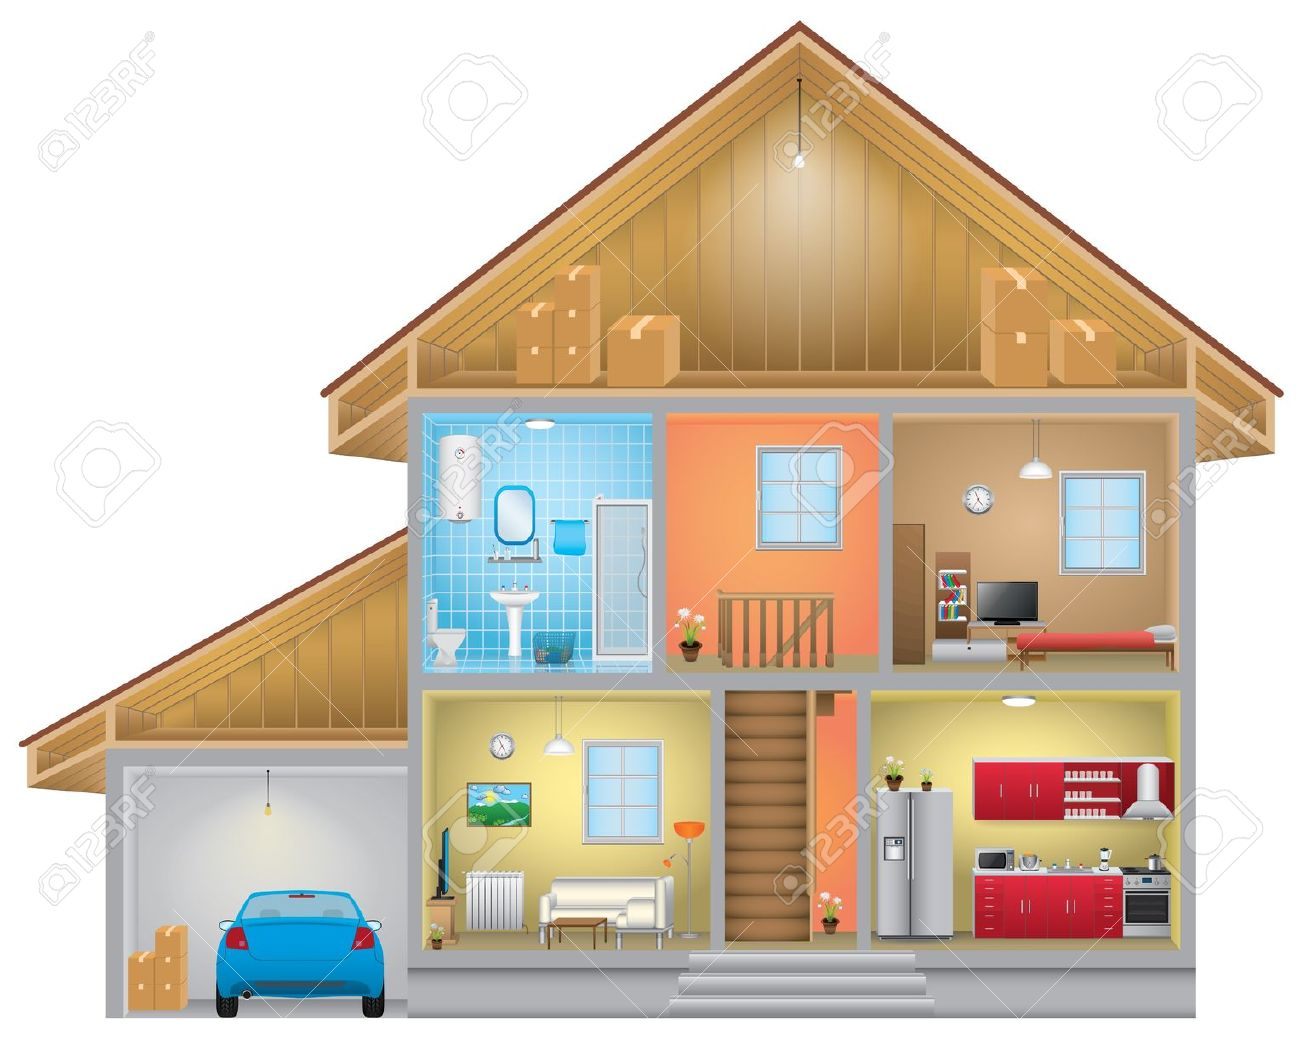 Hosue clipart my house Clipart house Clipart house home